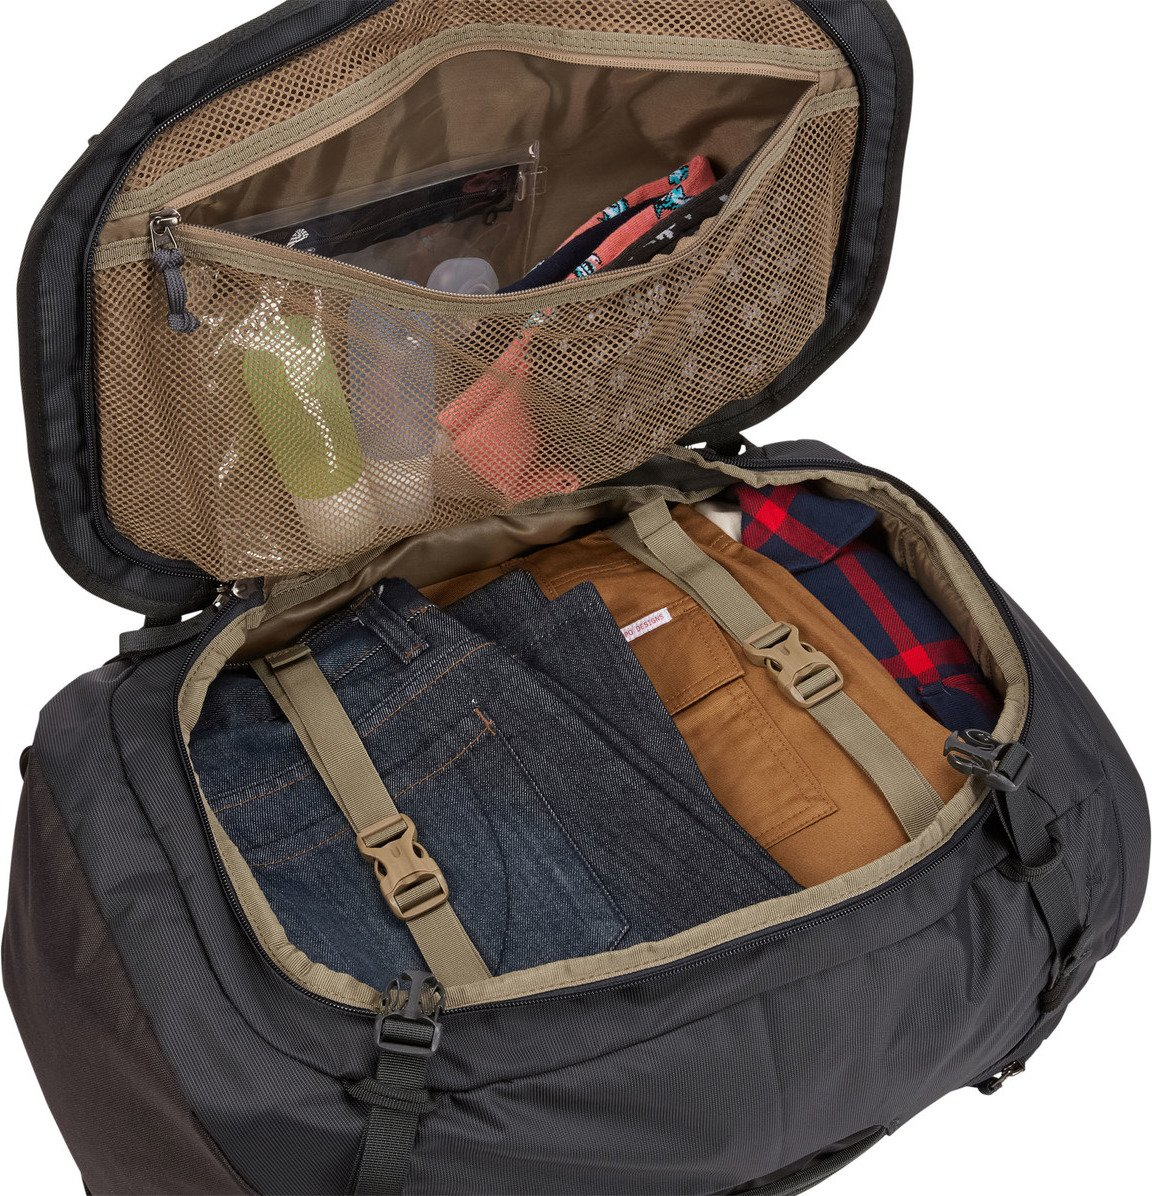 Plecak podróżny turystyczny Thule Landmark 40L czarny